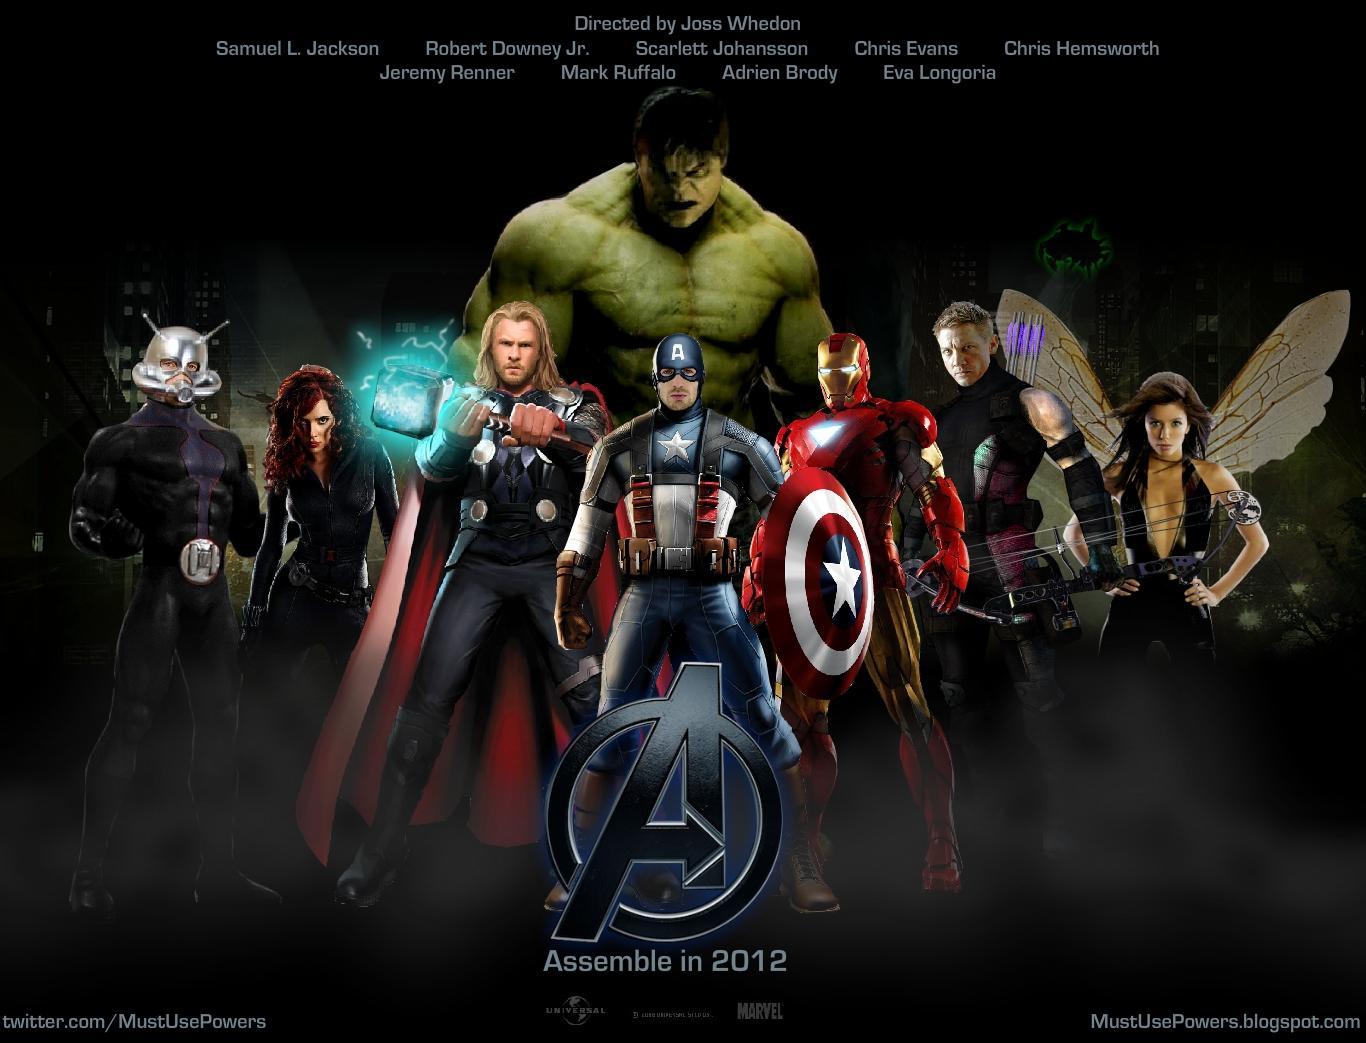 http://4.bp.blogspot.com/-rkZb0isdzWo/T6n02n0a90I/AAAAAAAABn0/2jVZ4vPij_Q/s1600/The+Avengers+2012+HQ%7Bfreehqwallpapers.blogspot.com%7D+%283%29.jpg